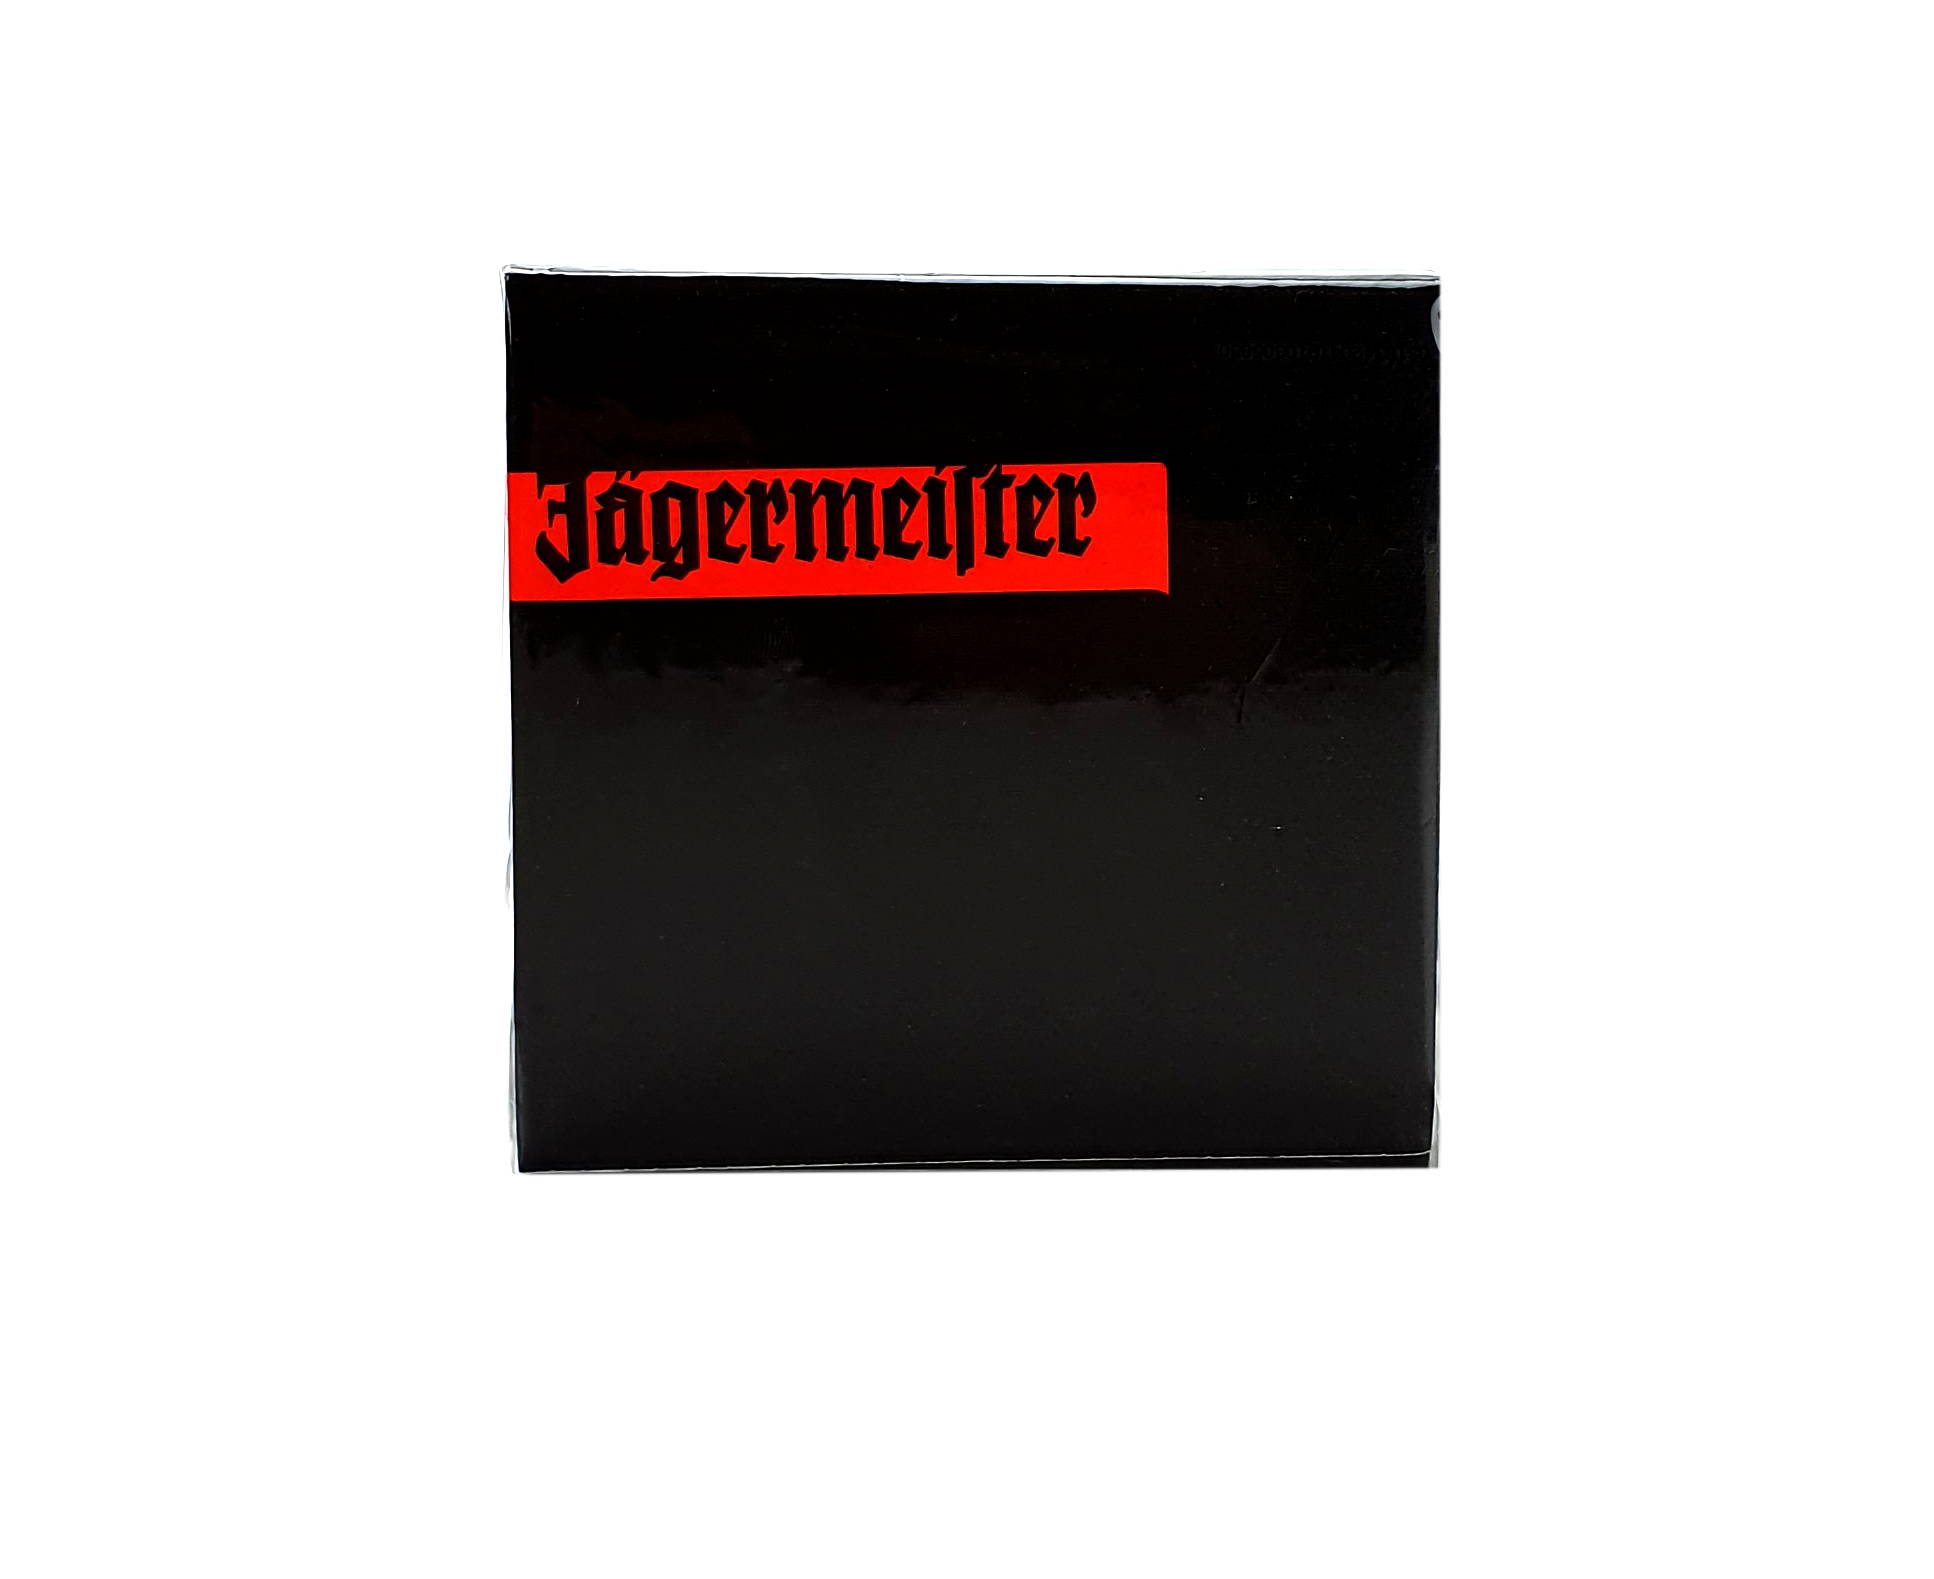 Jägermeister - Servietten / Cocktailservietten / 30 Stück